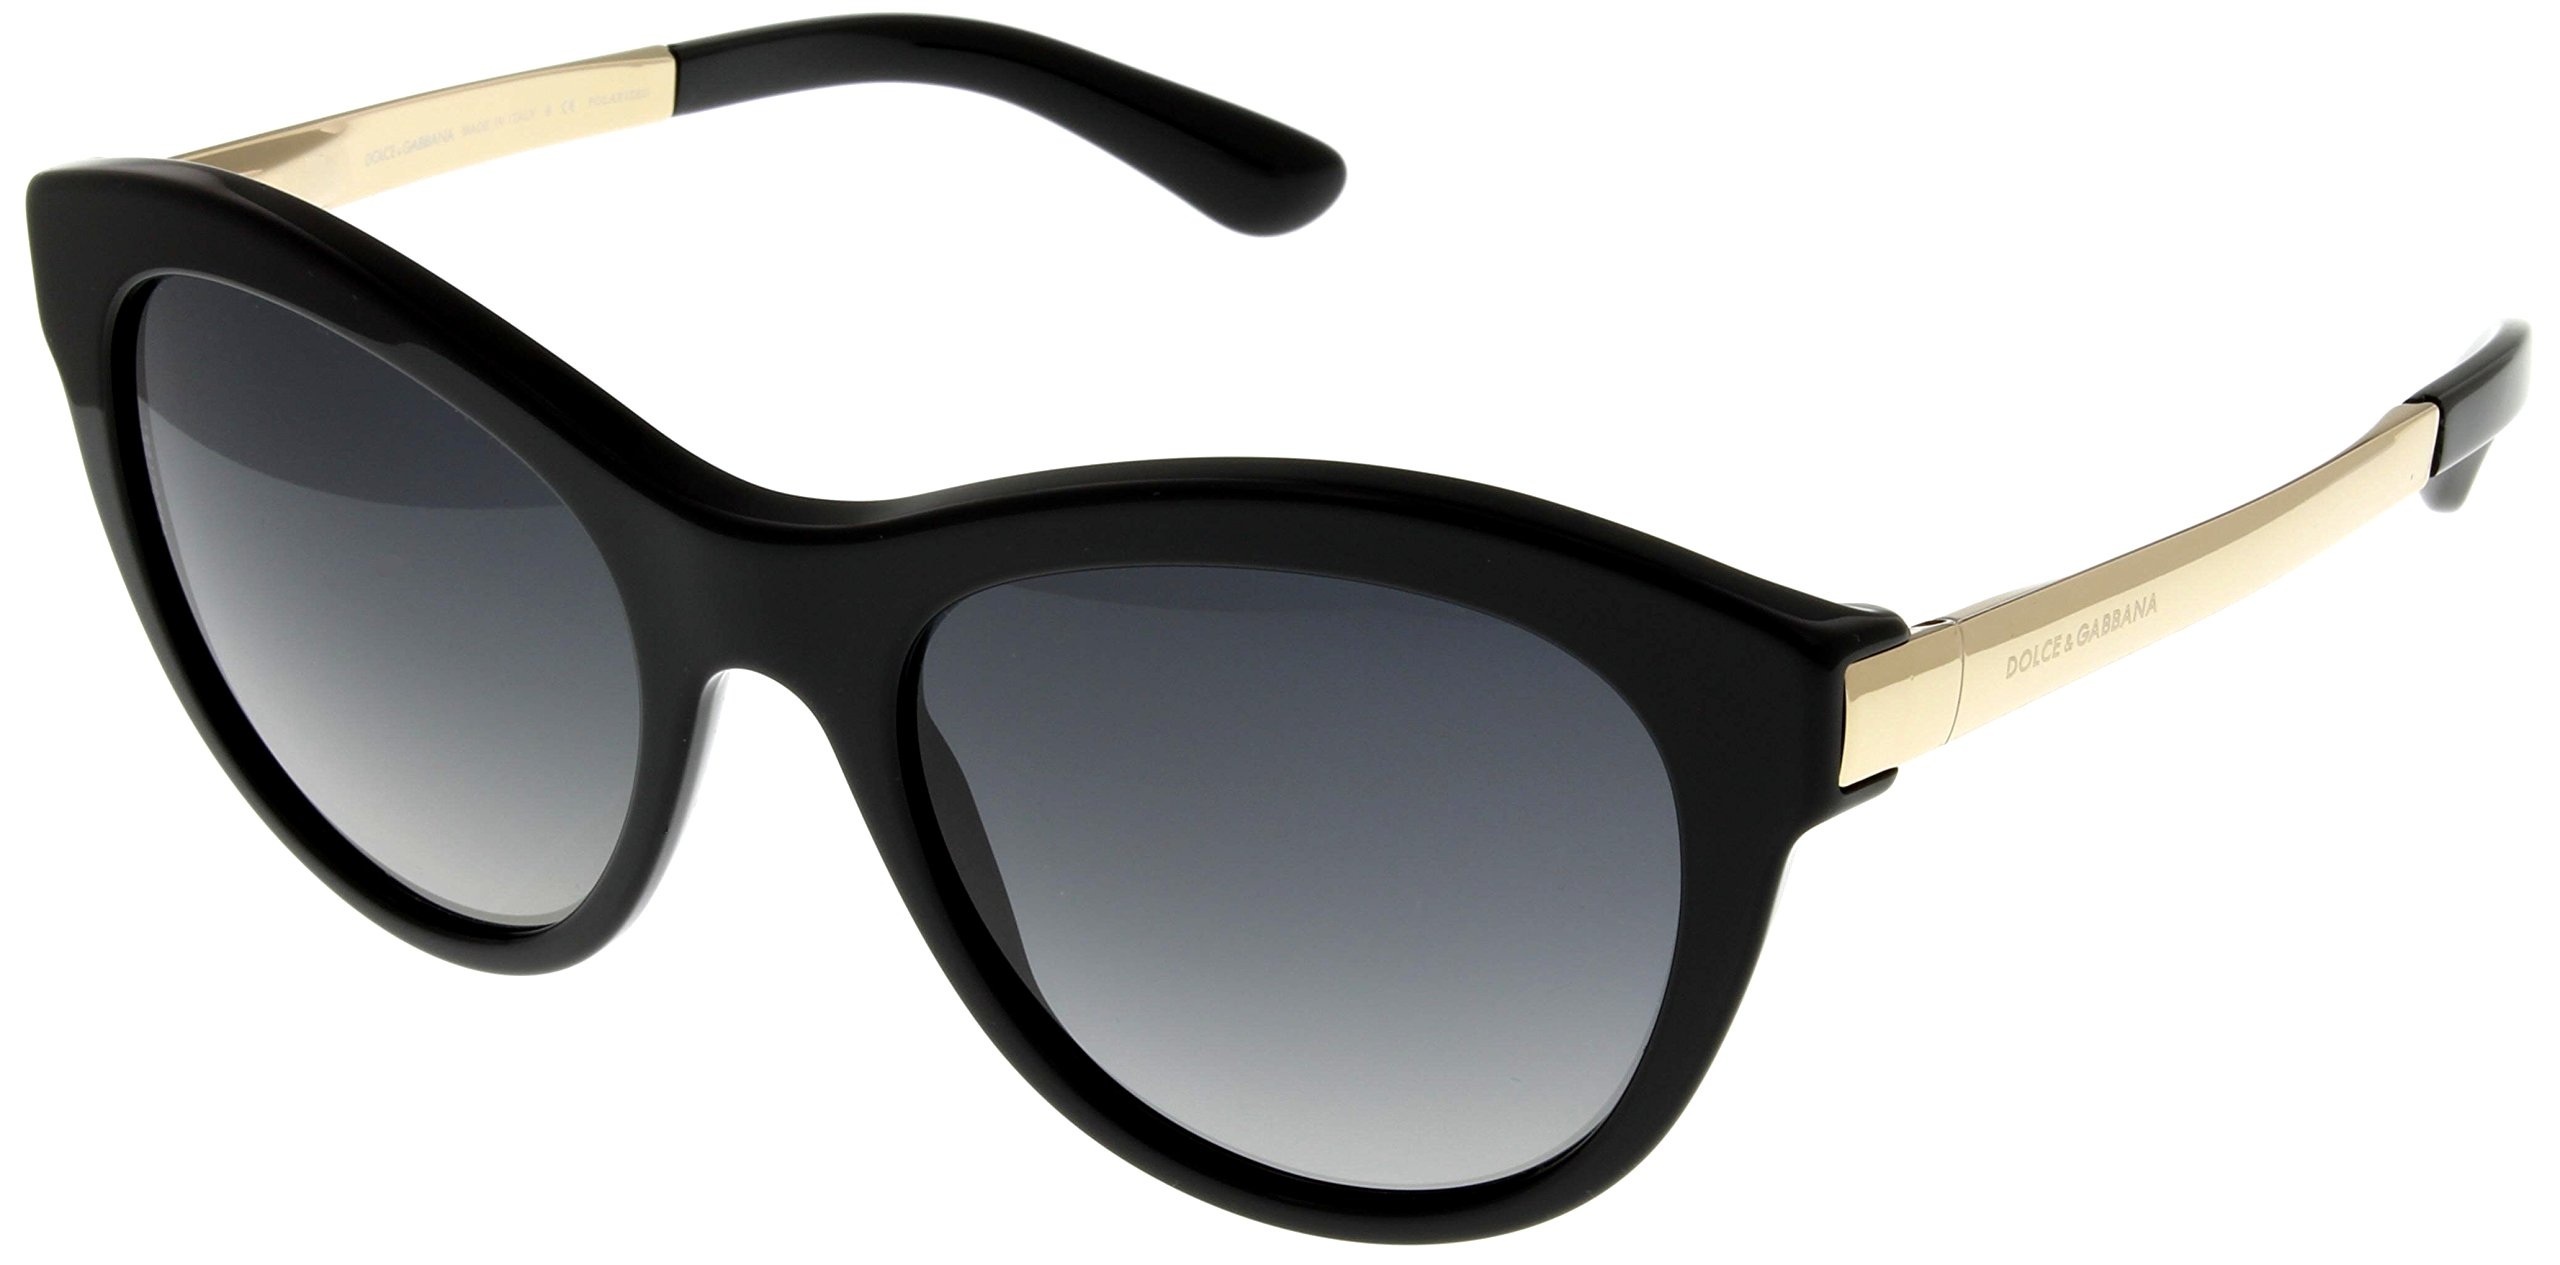 Dolce & Gabbana Sunglasses Women Polarized Black DG4243 501/T3